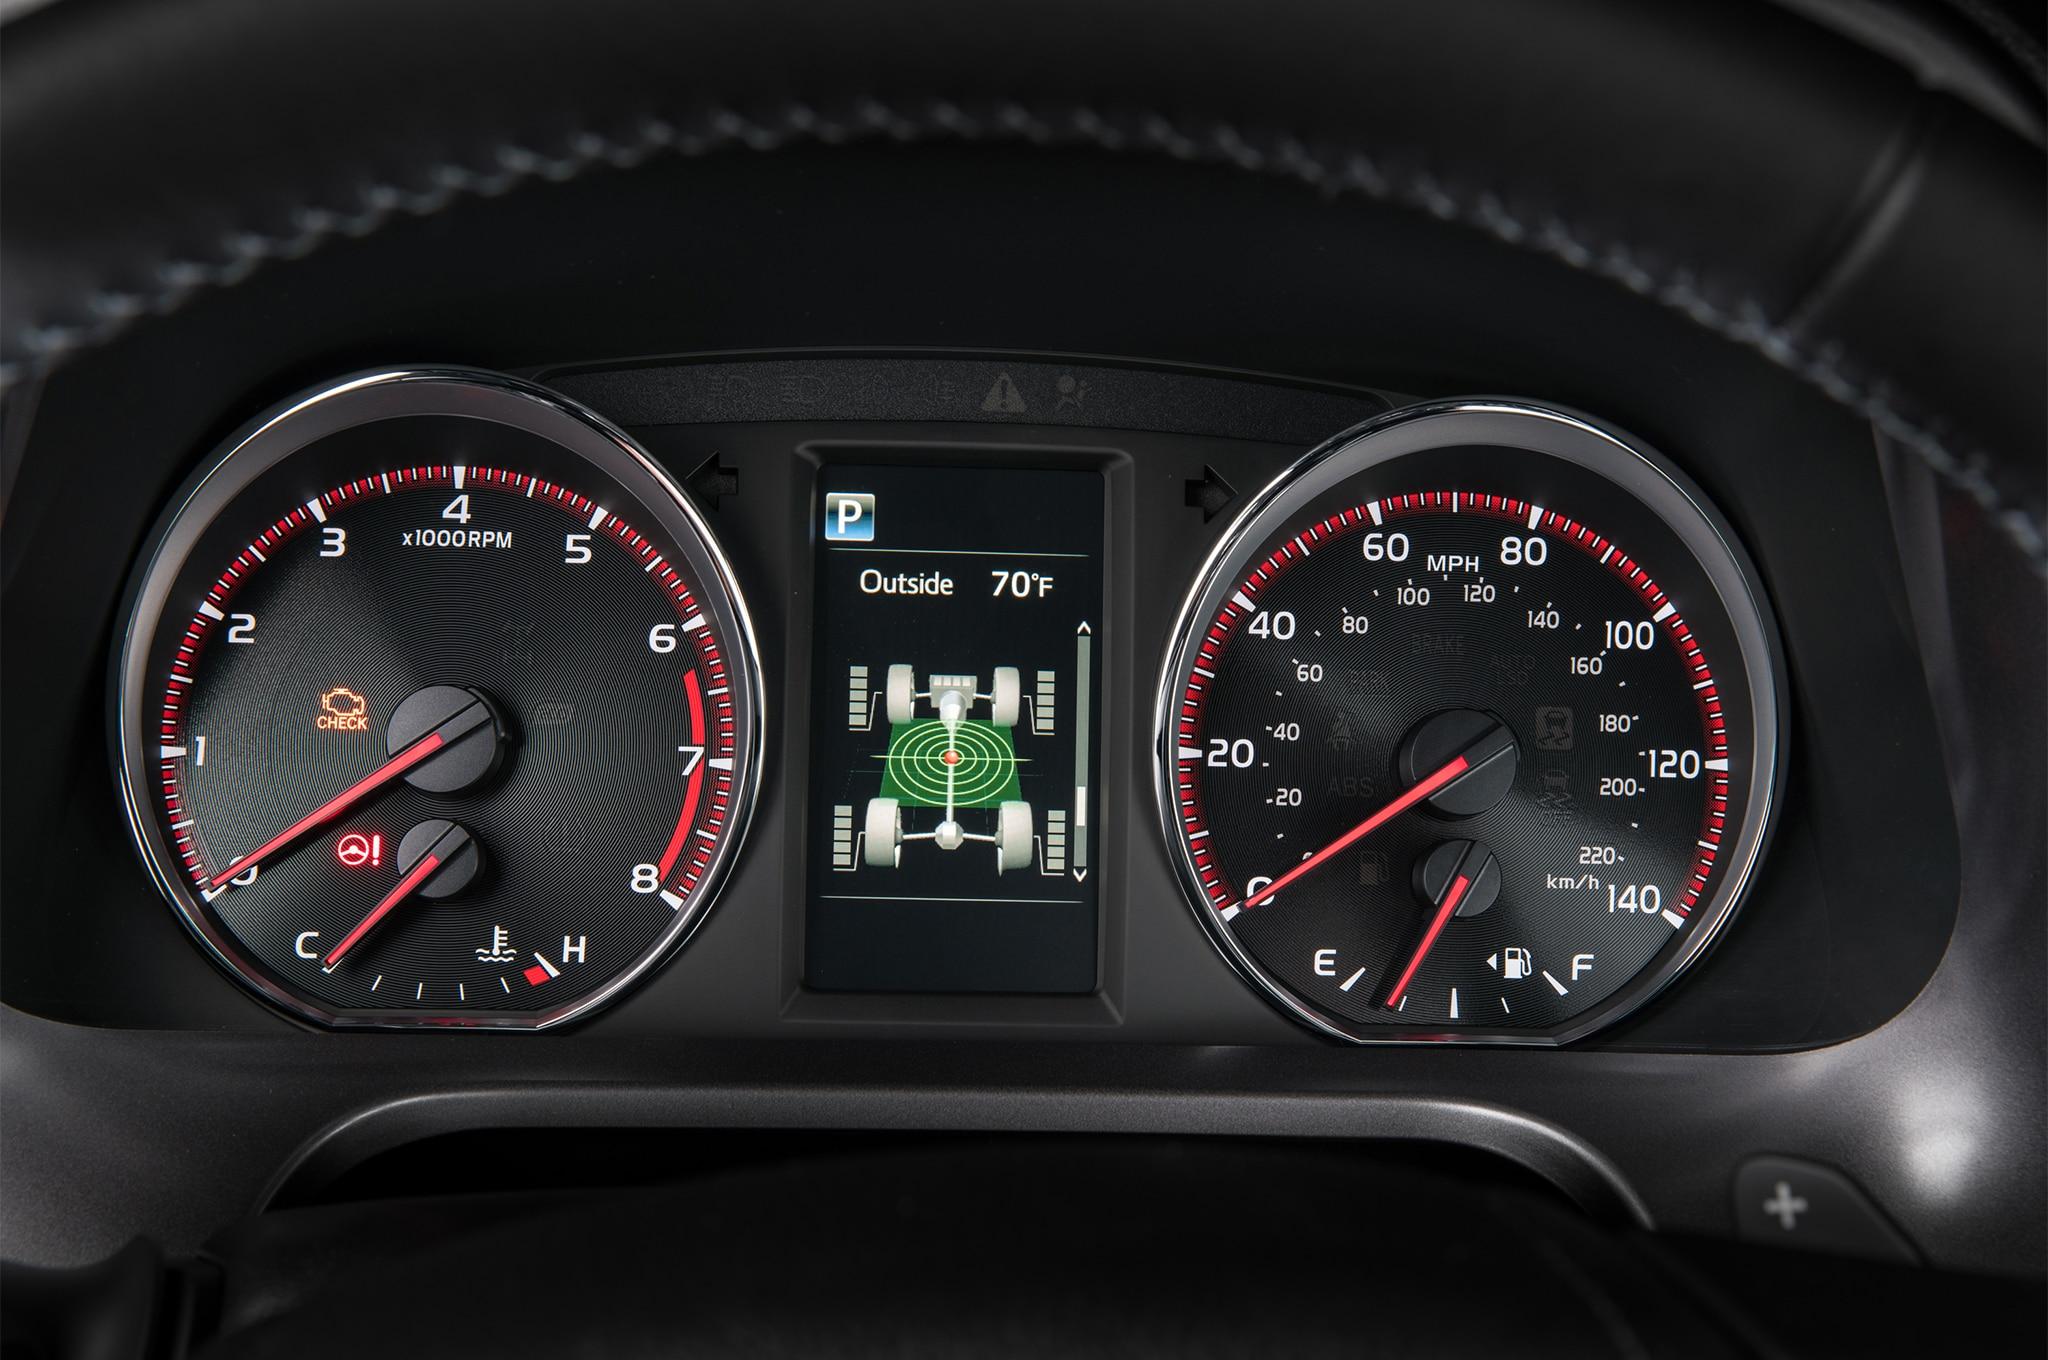 2017 Toyota Rav4 Se Instrument Panel Motor Trend En Espa 241 Ol